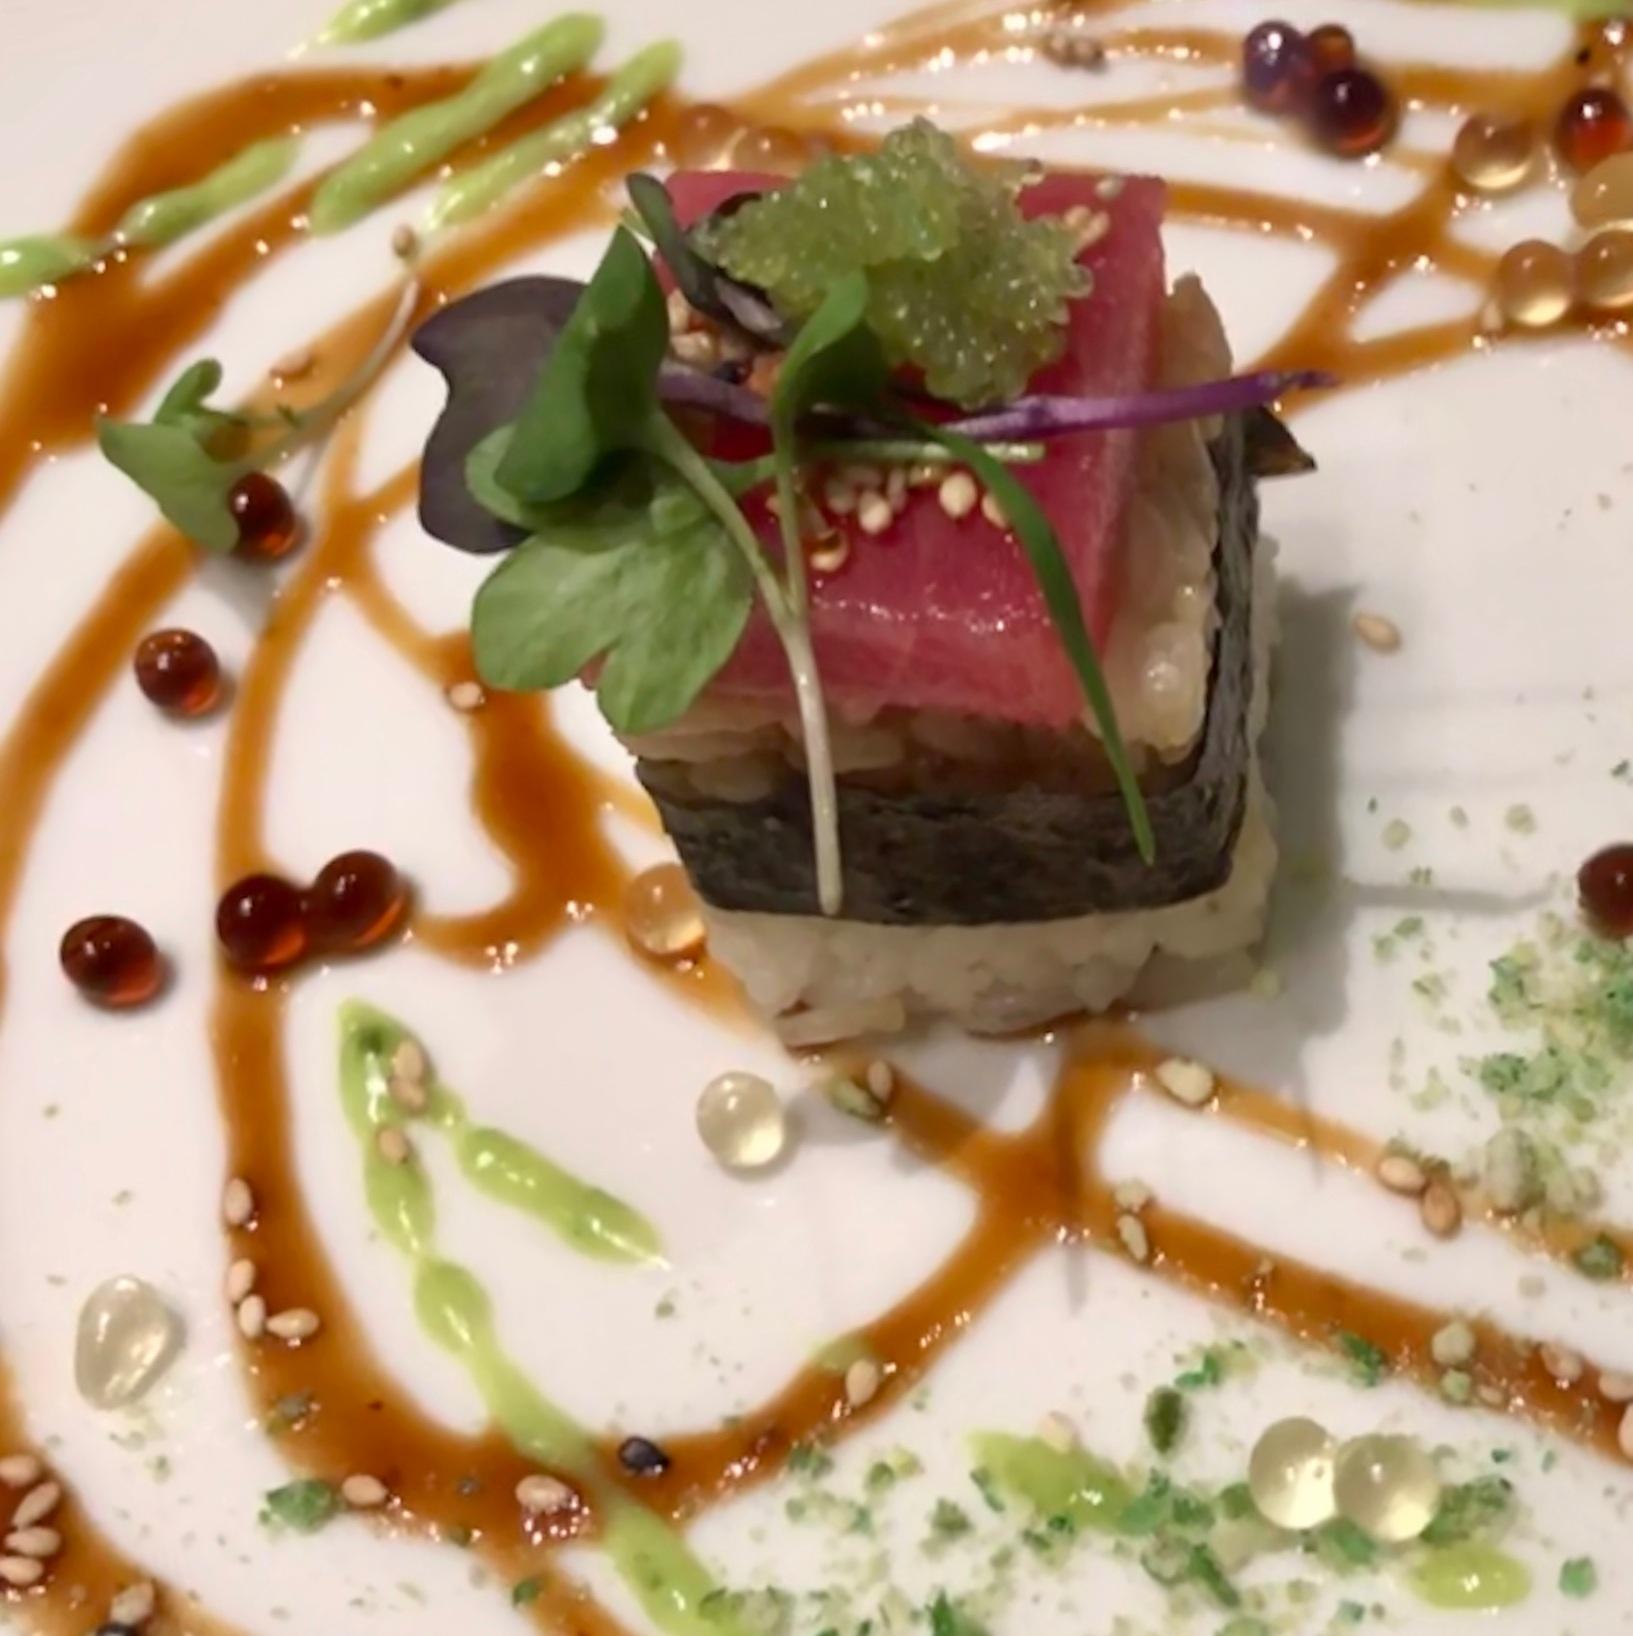 Tuxedo Tuna: Ahi Tuna Soy Pearls/Yuzu Pearls/Wasabi Sauce/Wasabi Caviar/Wasabi Pea Dust